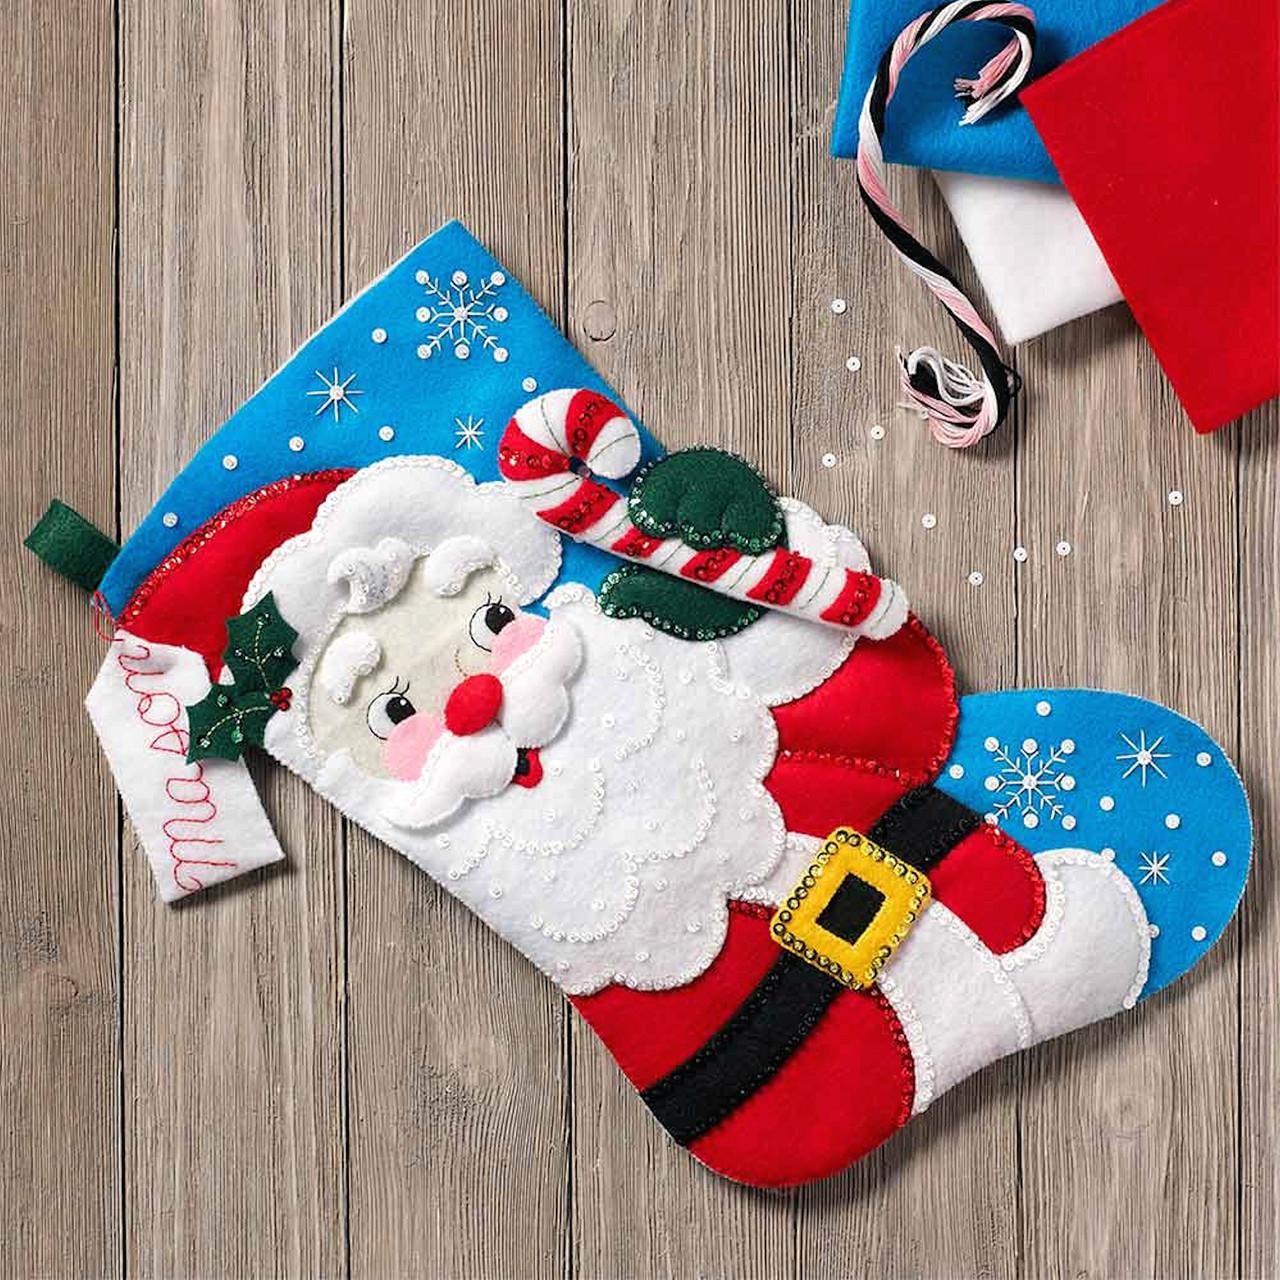 Plaid / Bucilla - Hello Santa Stocking